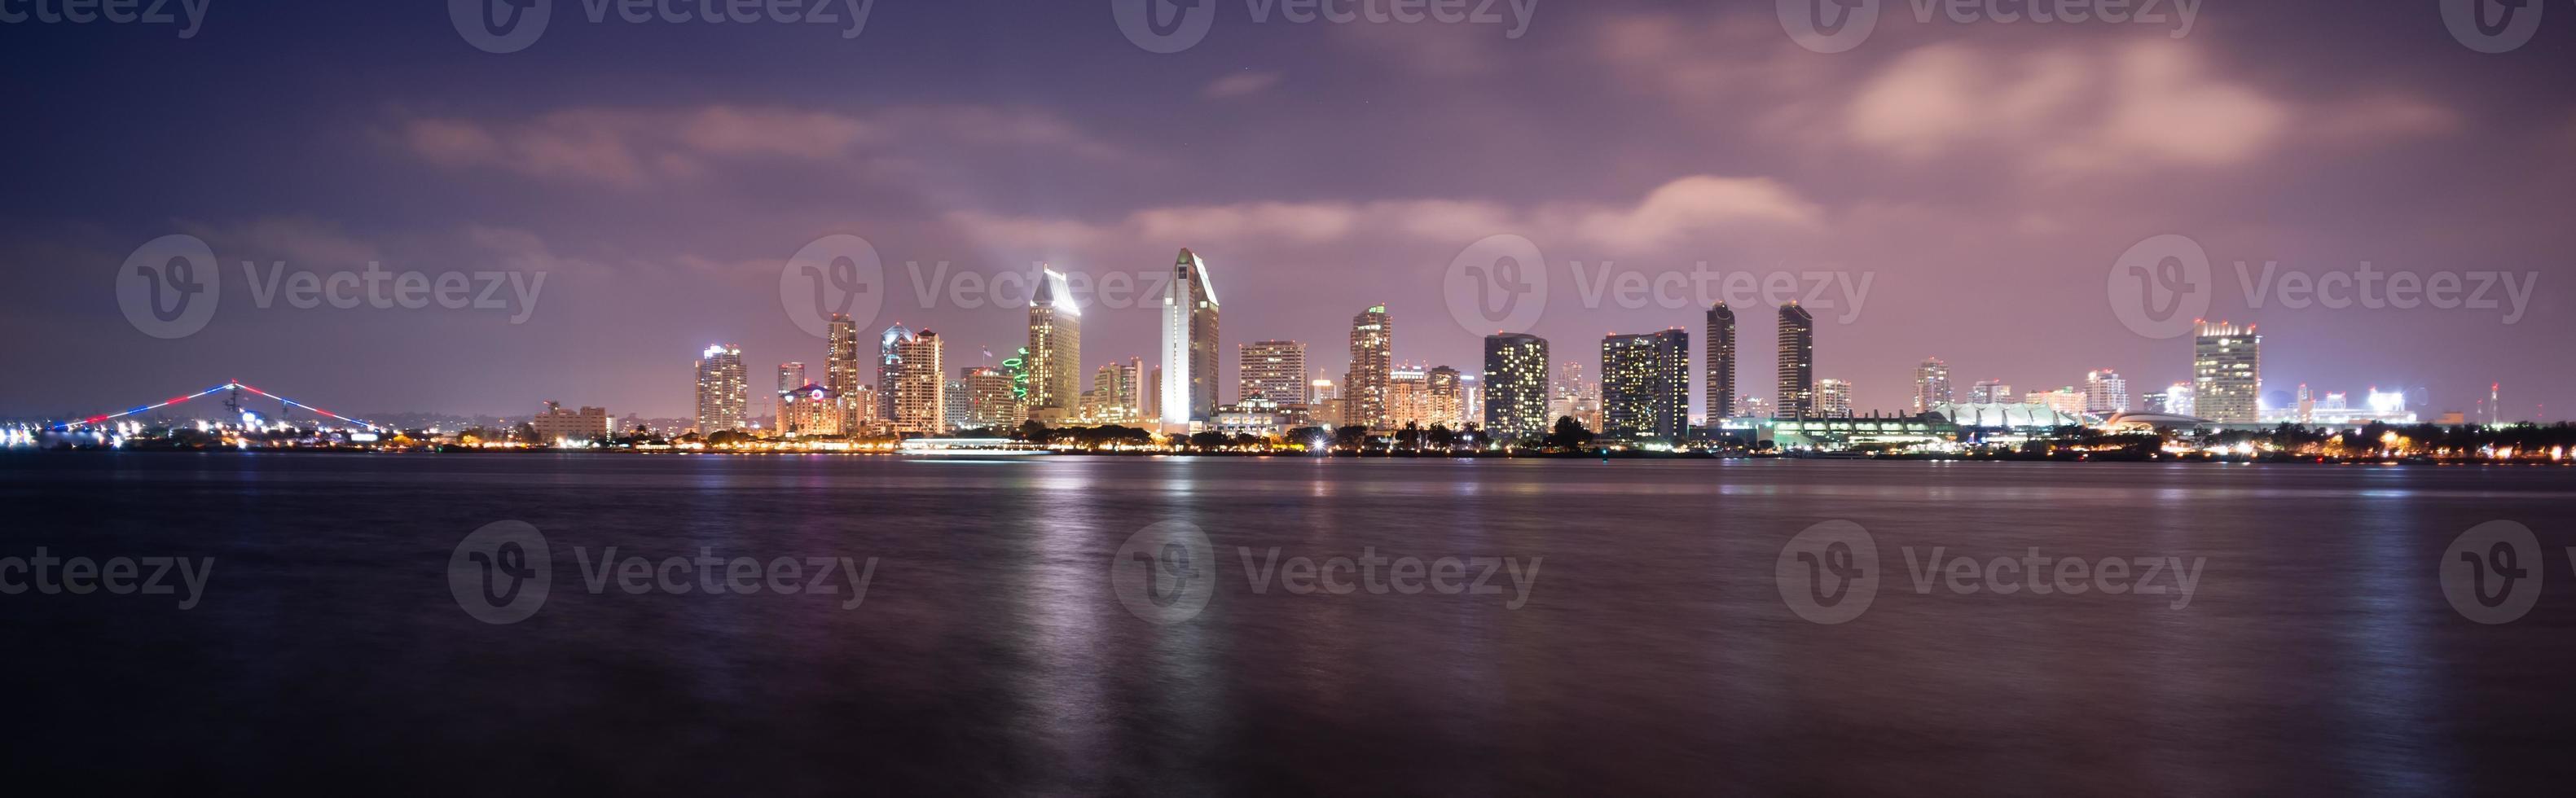 Late Night Coronado San Diego Bay Downtown City Skyline photo